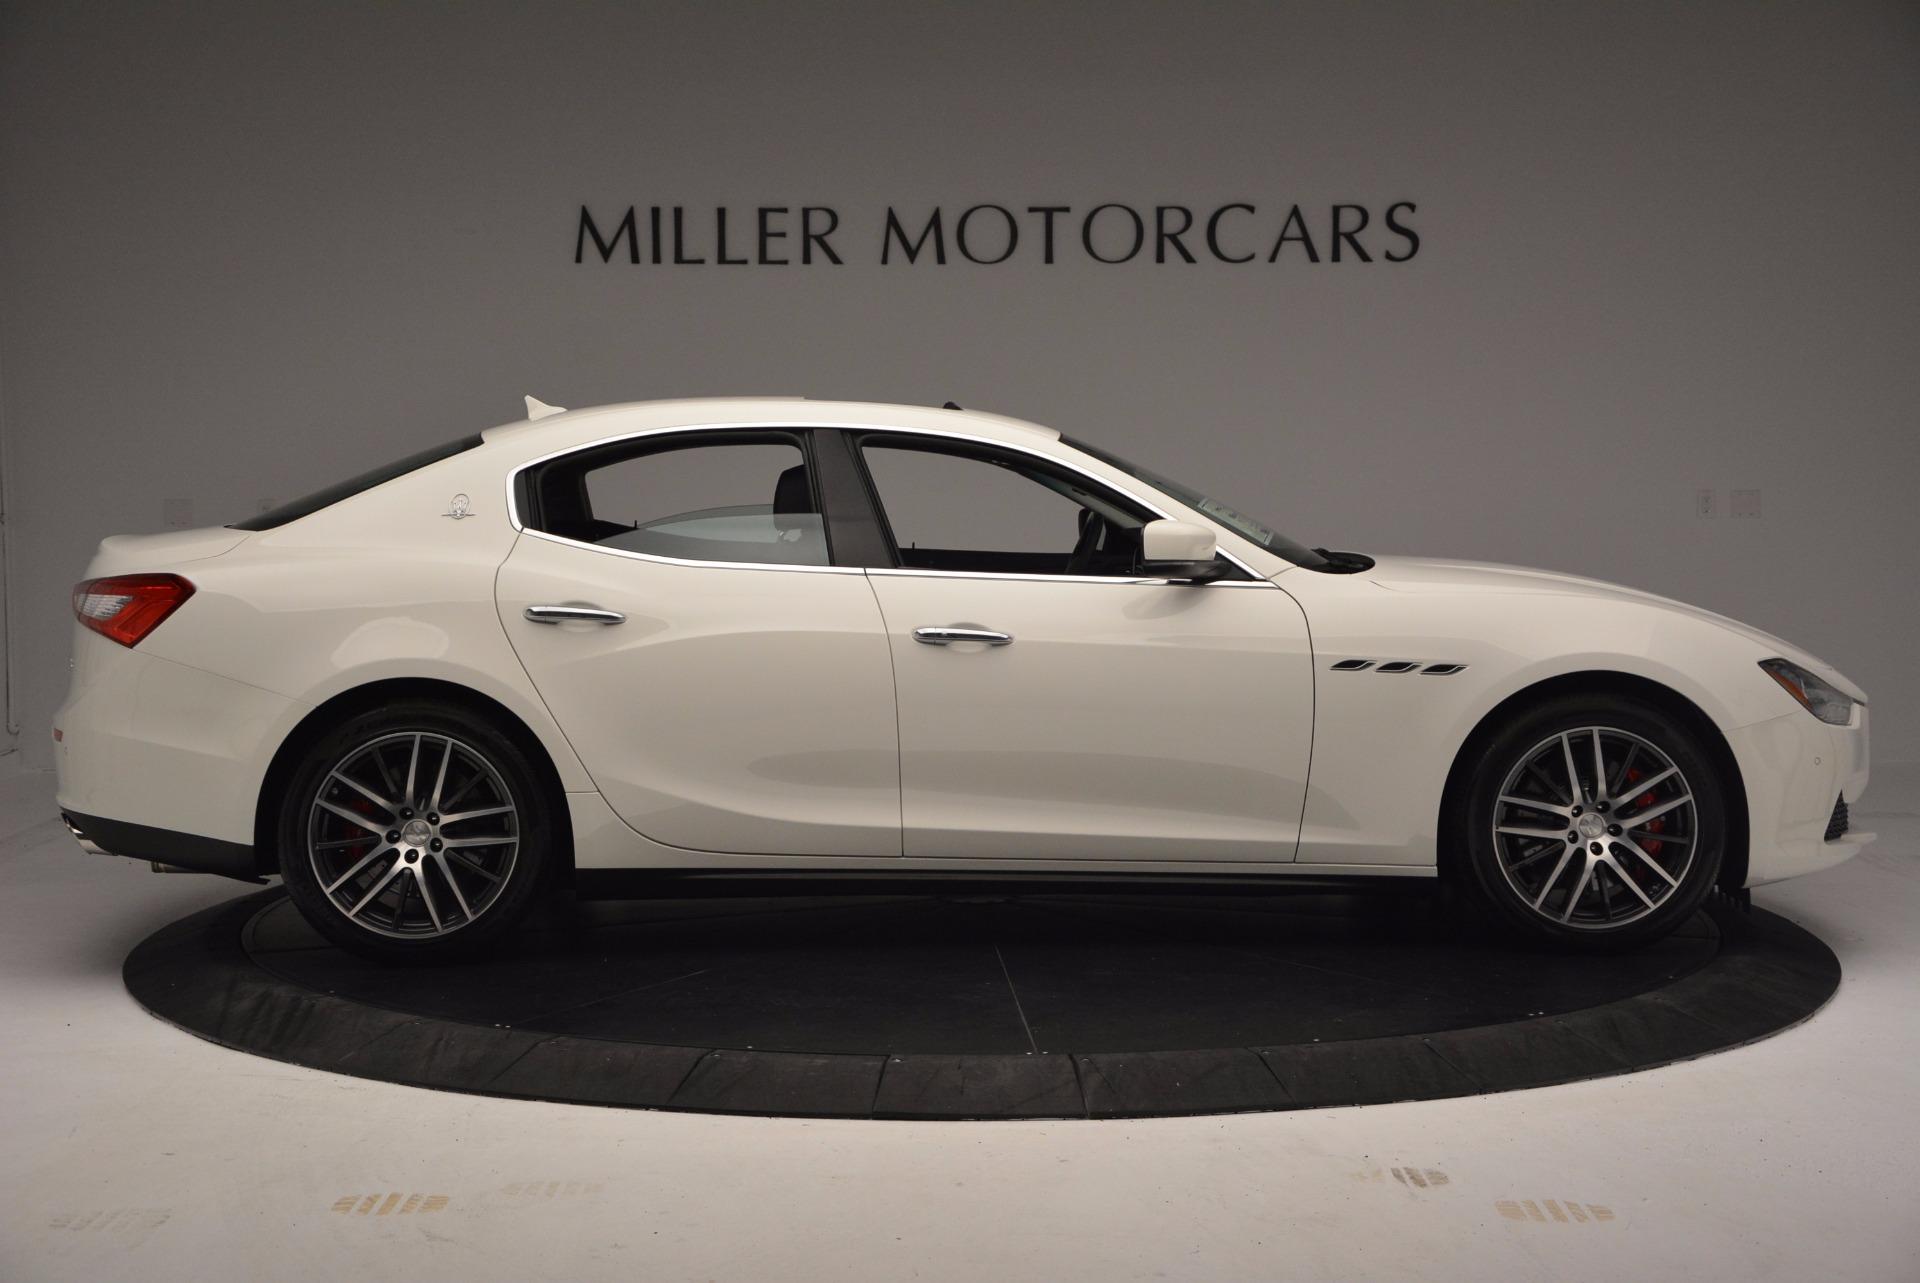 Used 2017 Maserati Ghibli S Q4 For Sale In Greenwich, CT. Alfa Romeo of Greenwich, M2184 813_p10